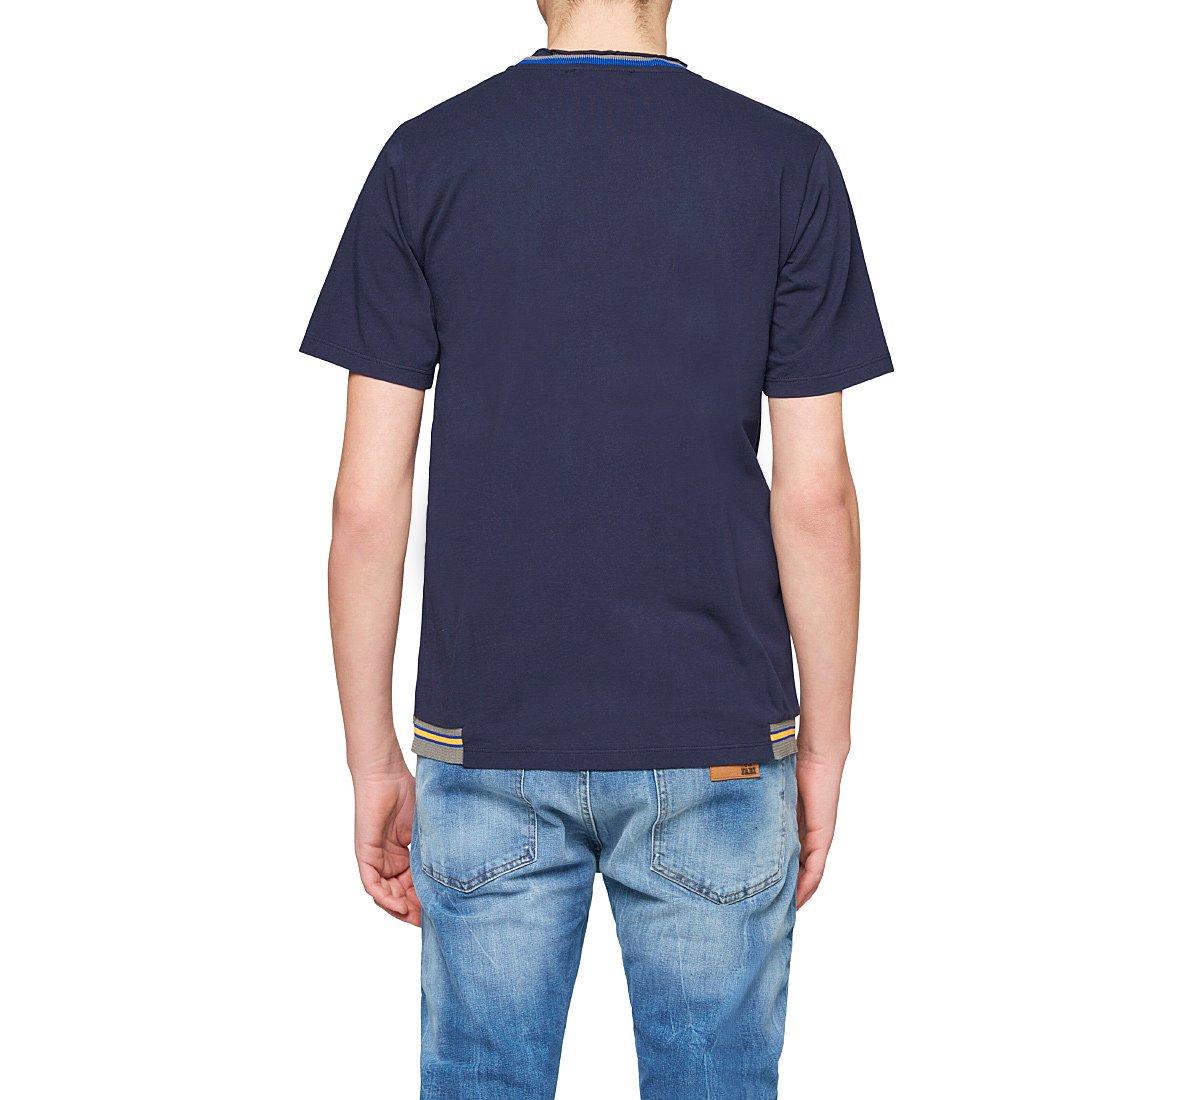 Maglietta basic a maniche corte